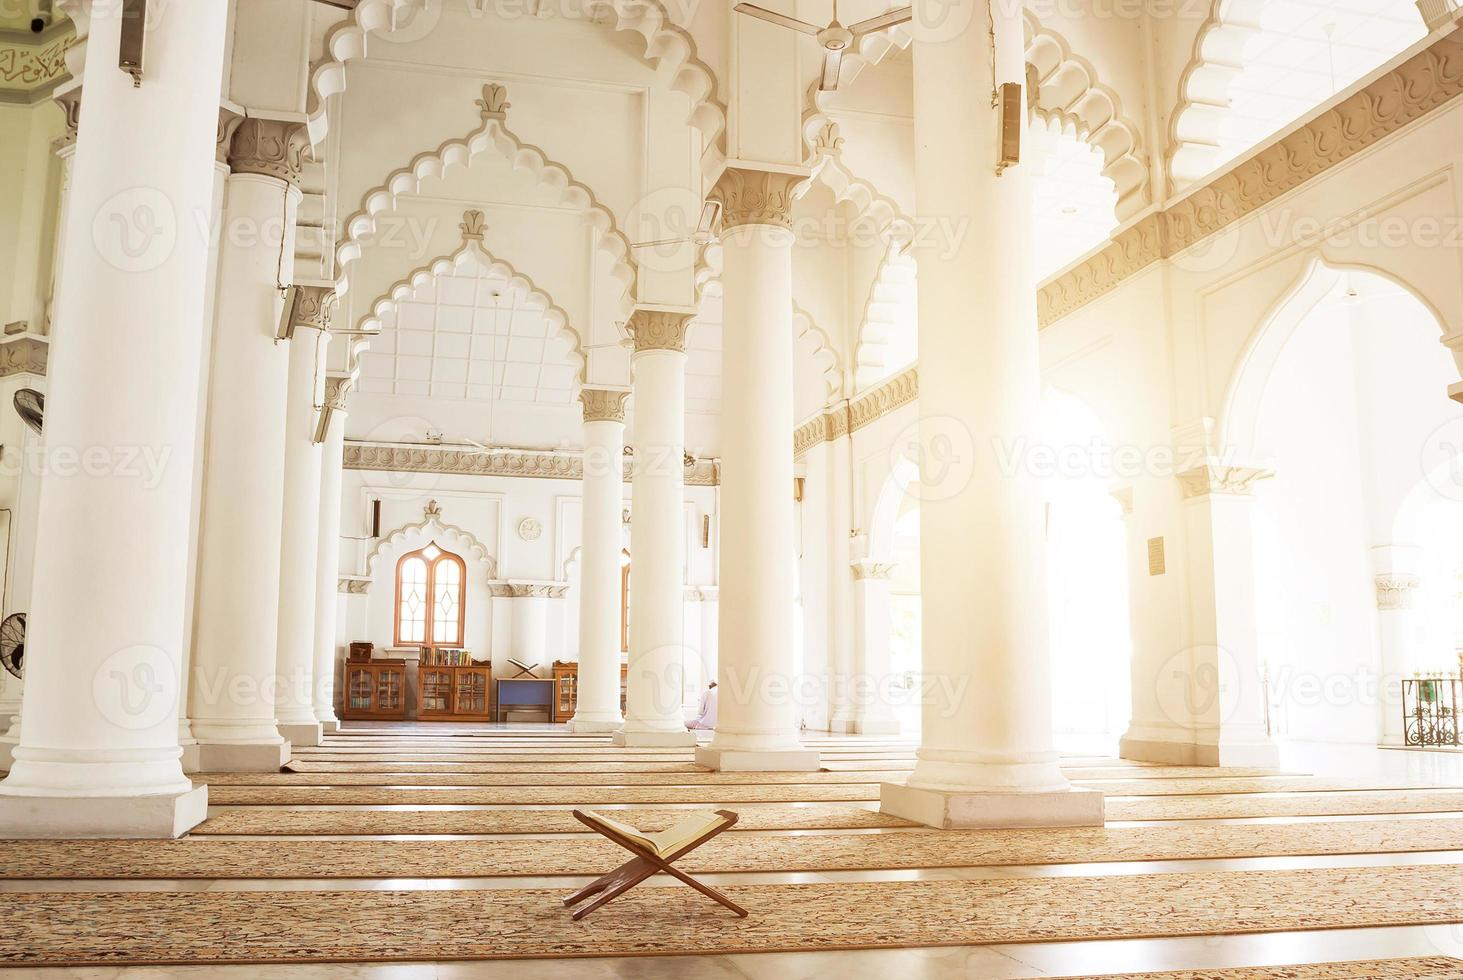 interior da mesquita da Malásia foto